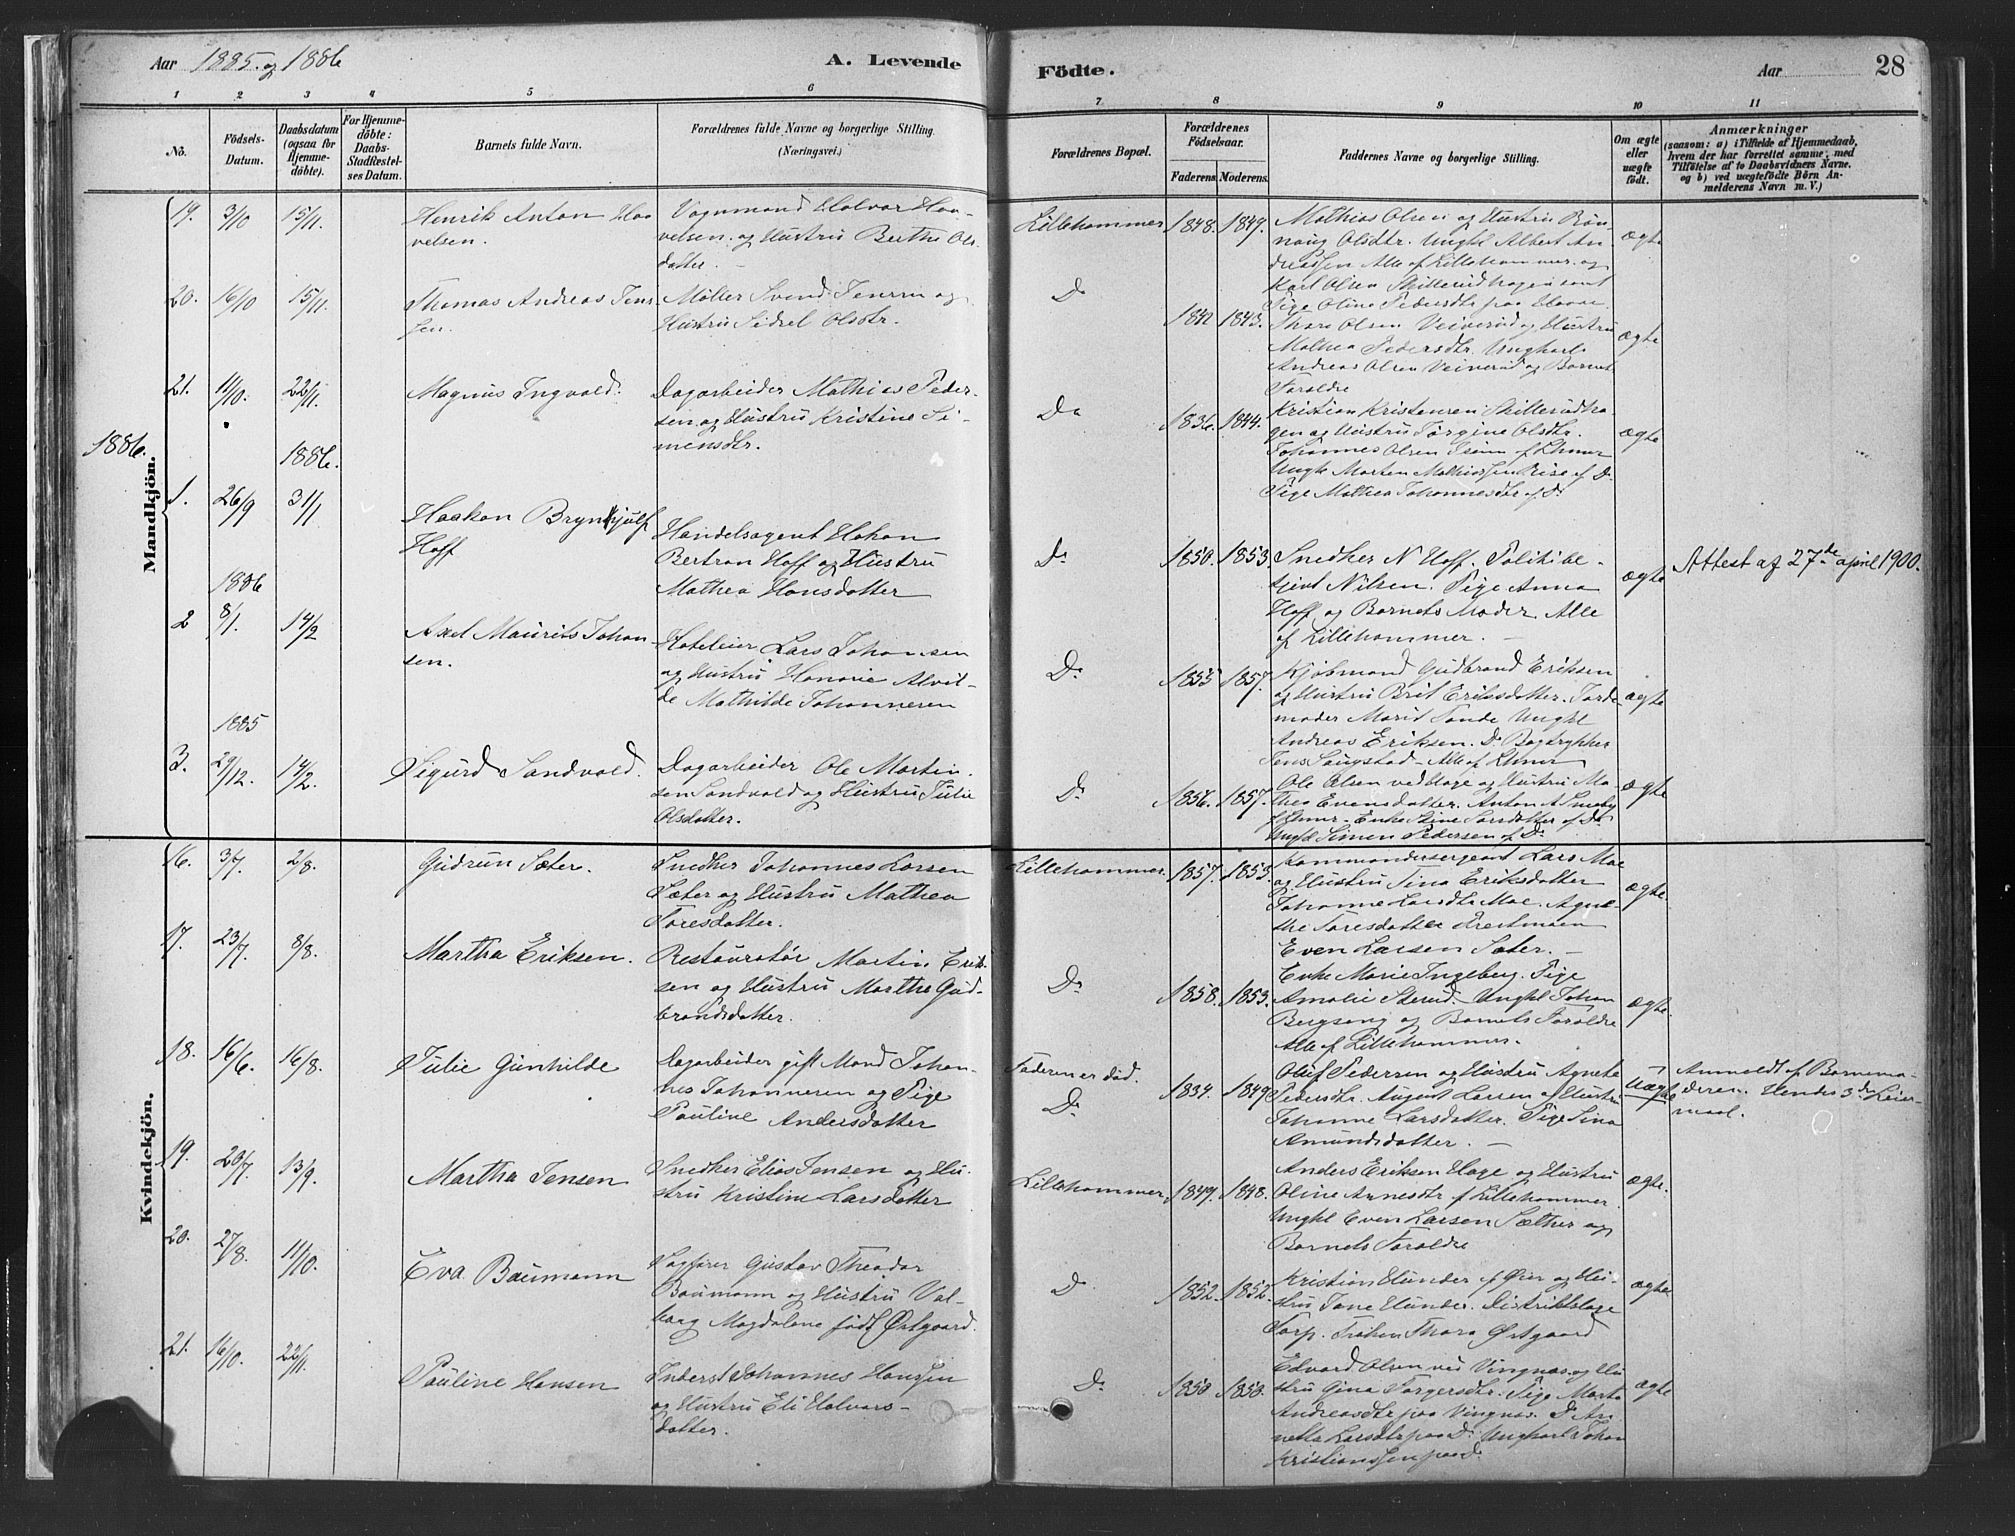 SAH, Fåberg prestekontor, Ministerialbok nr. 10, 1879-1900, s. 28